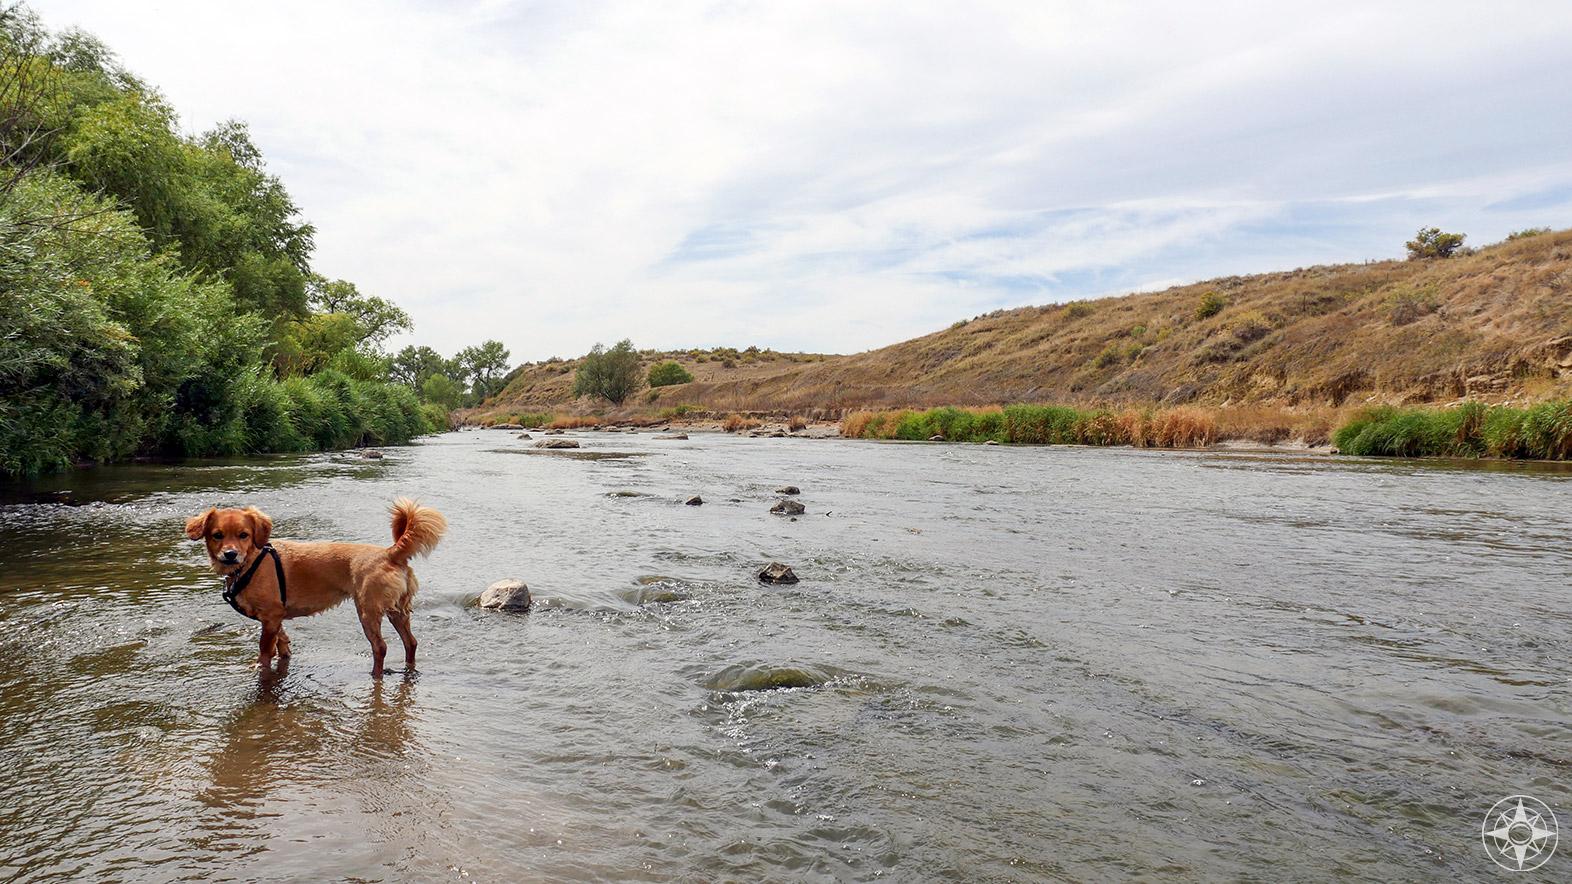 Whiskey Dog in St. Vrain River